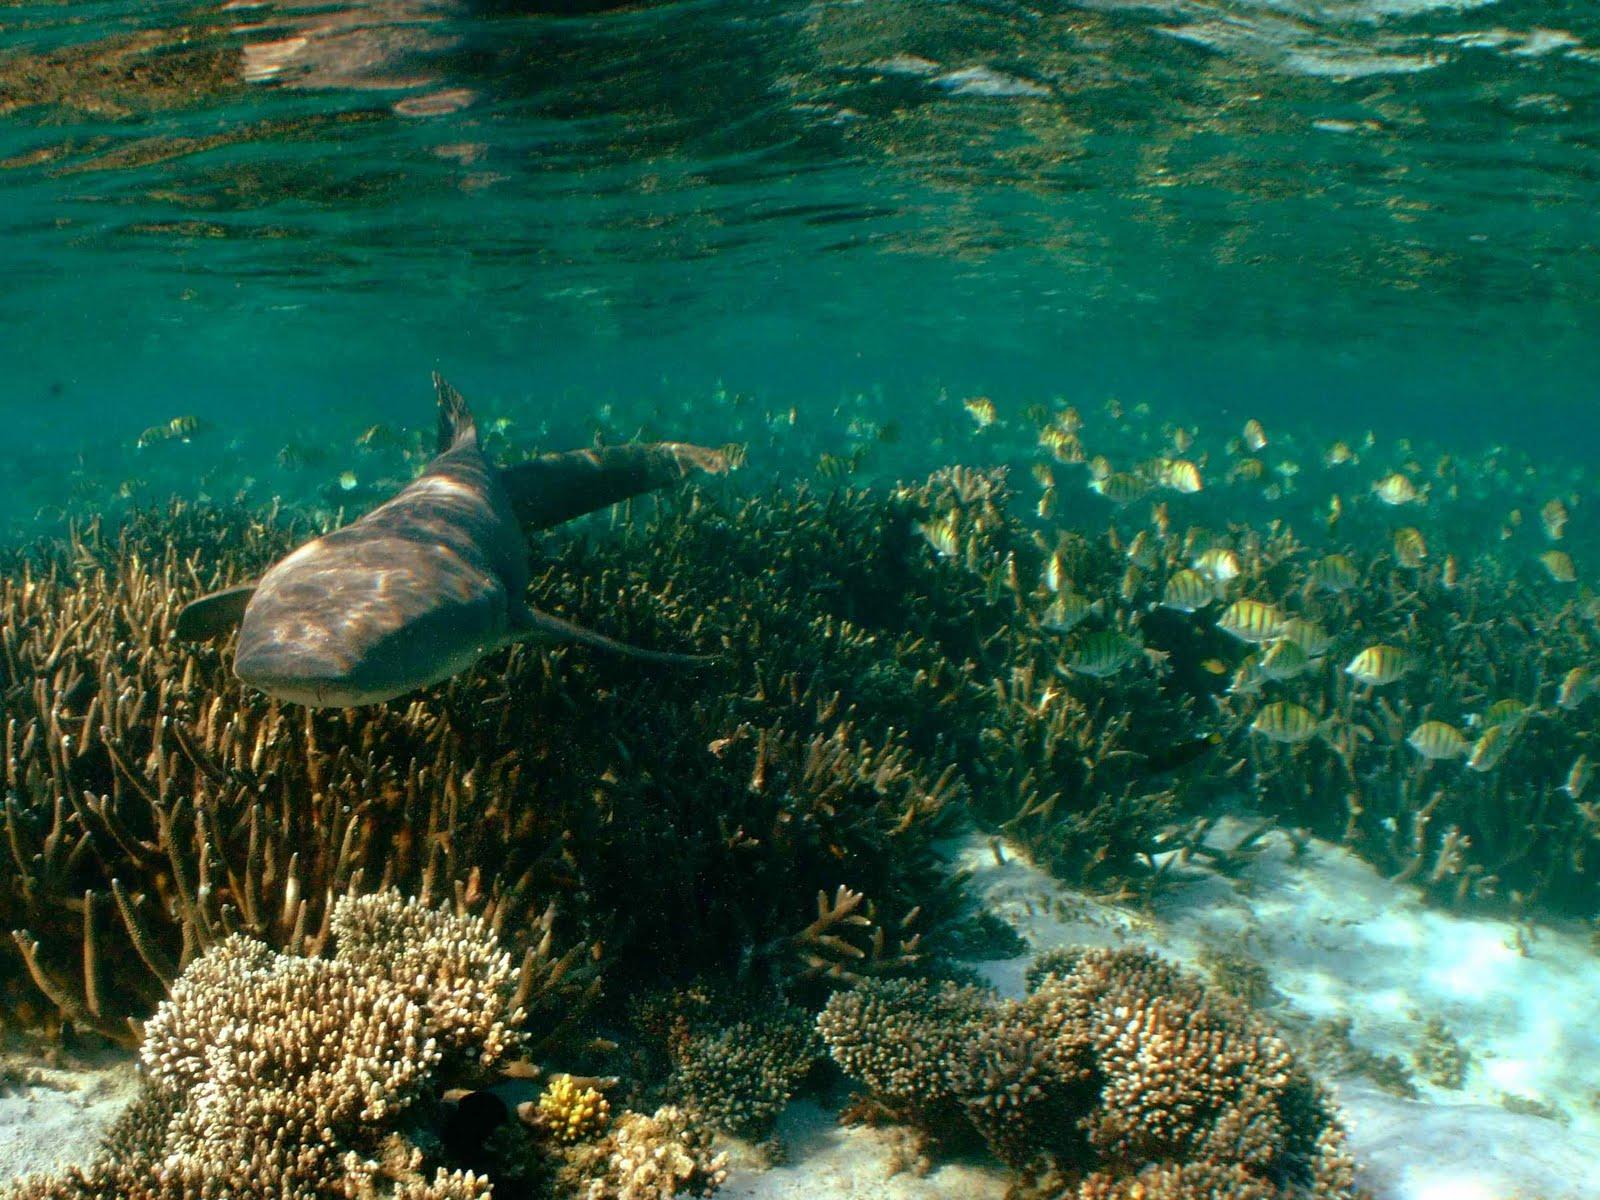 Sail ningaloo ningaloo reef dive liveaboard - Ningaloo reef dive ...